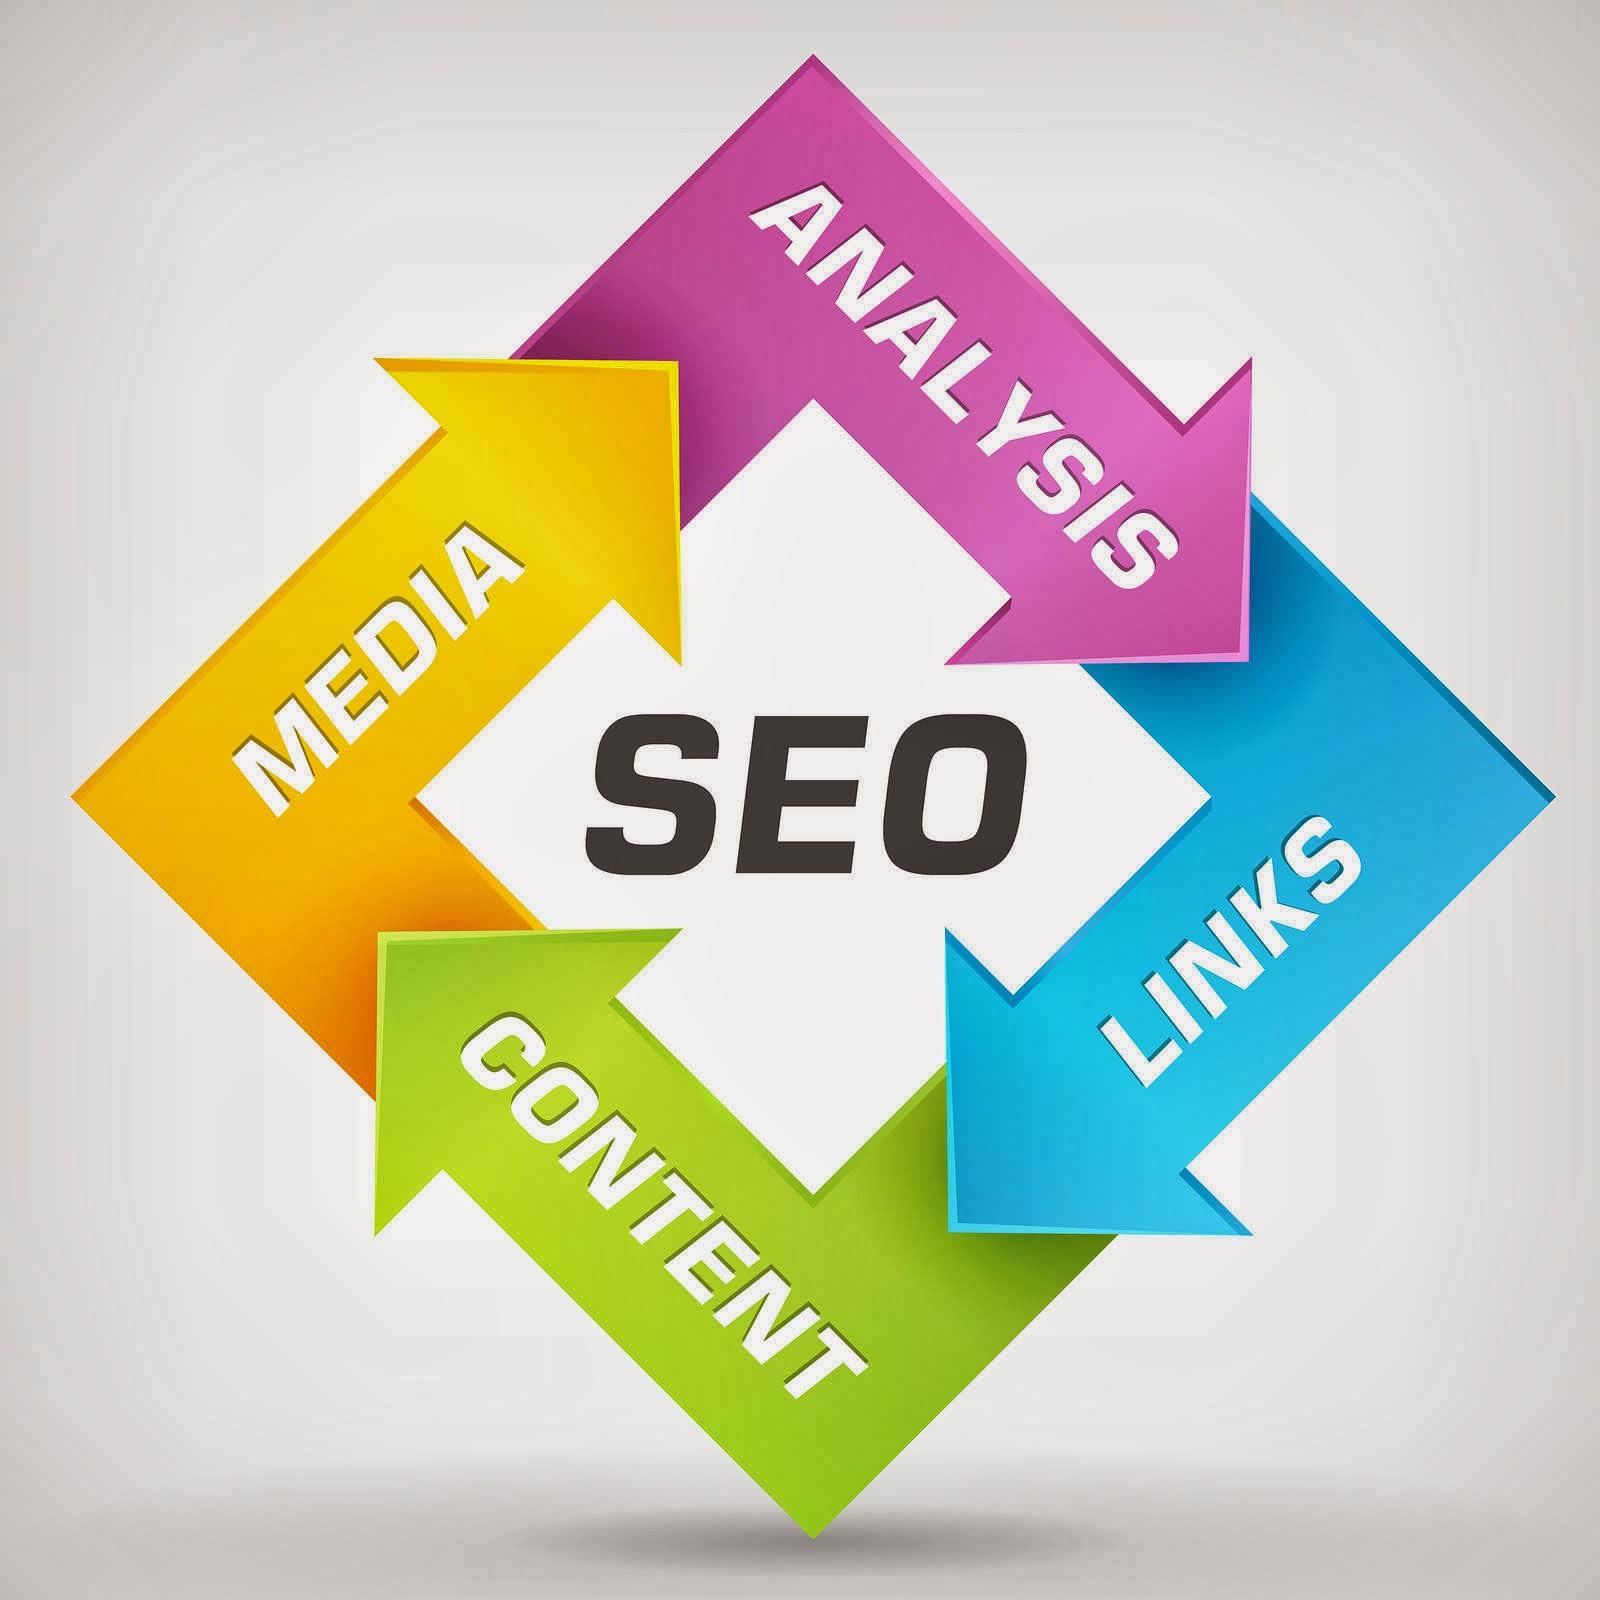 Marketing: Digital Marketing Toronto Company & Online Advertising